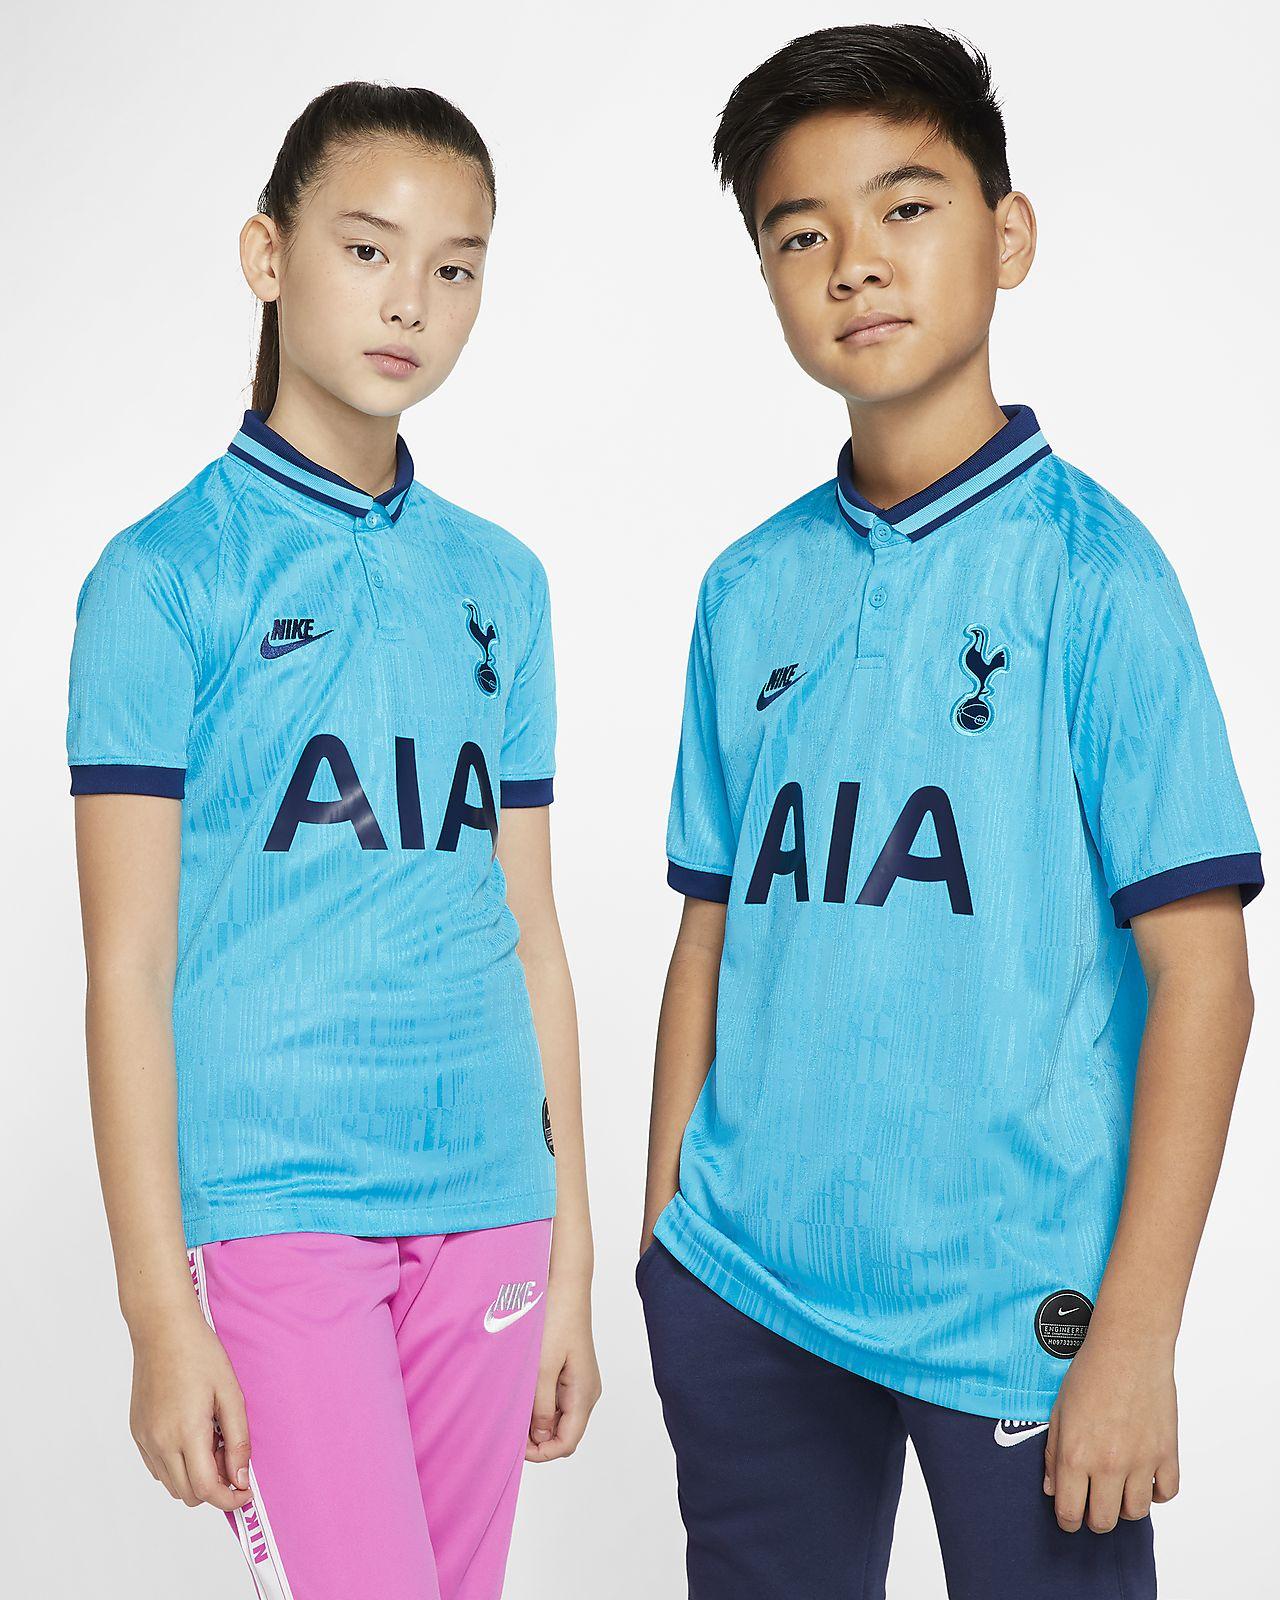 huge selection of 3d091 836b9 Tottenham Hotspur 2019/20 Stadium Third Big Kids' Soccer Jersey